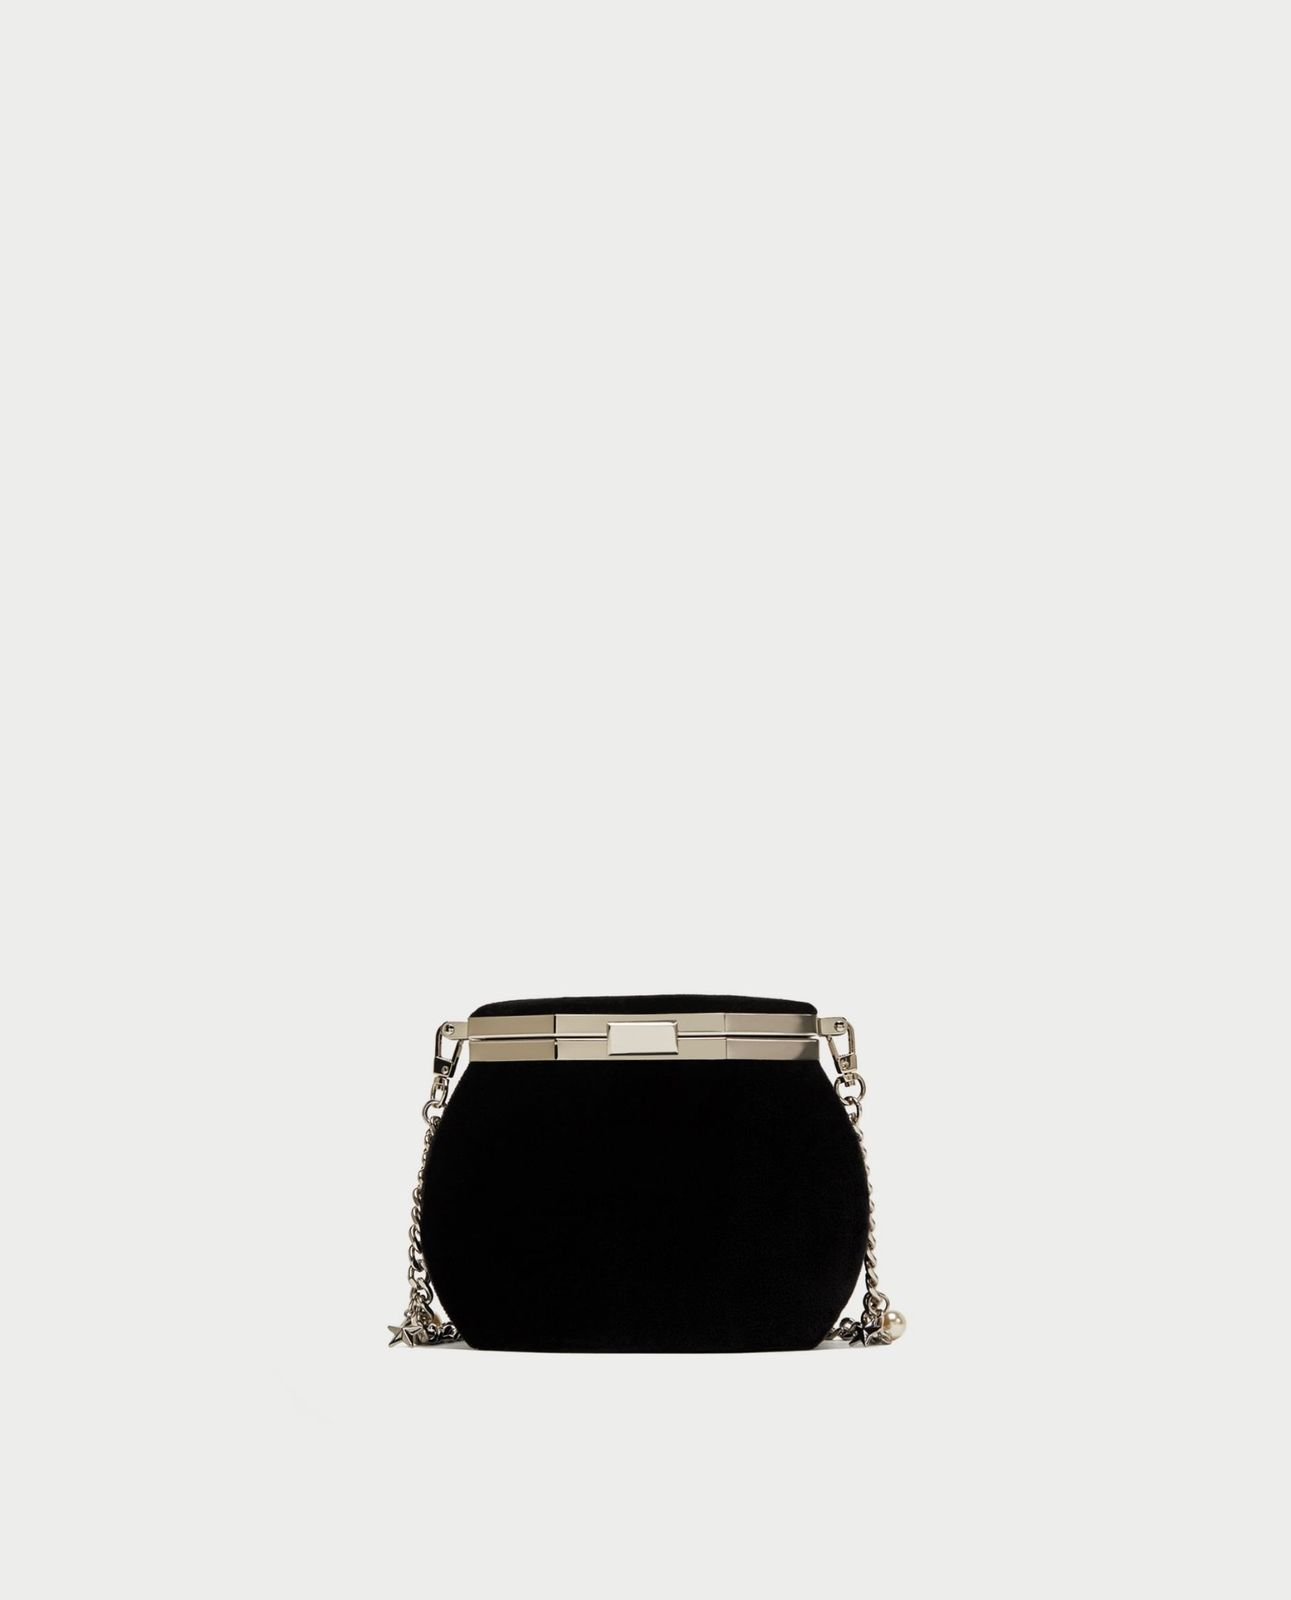 d81cc72e51 BNWT ZARA Black Crossbody Bag With Clasp And and 50 similar items